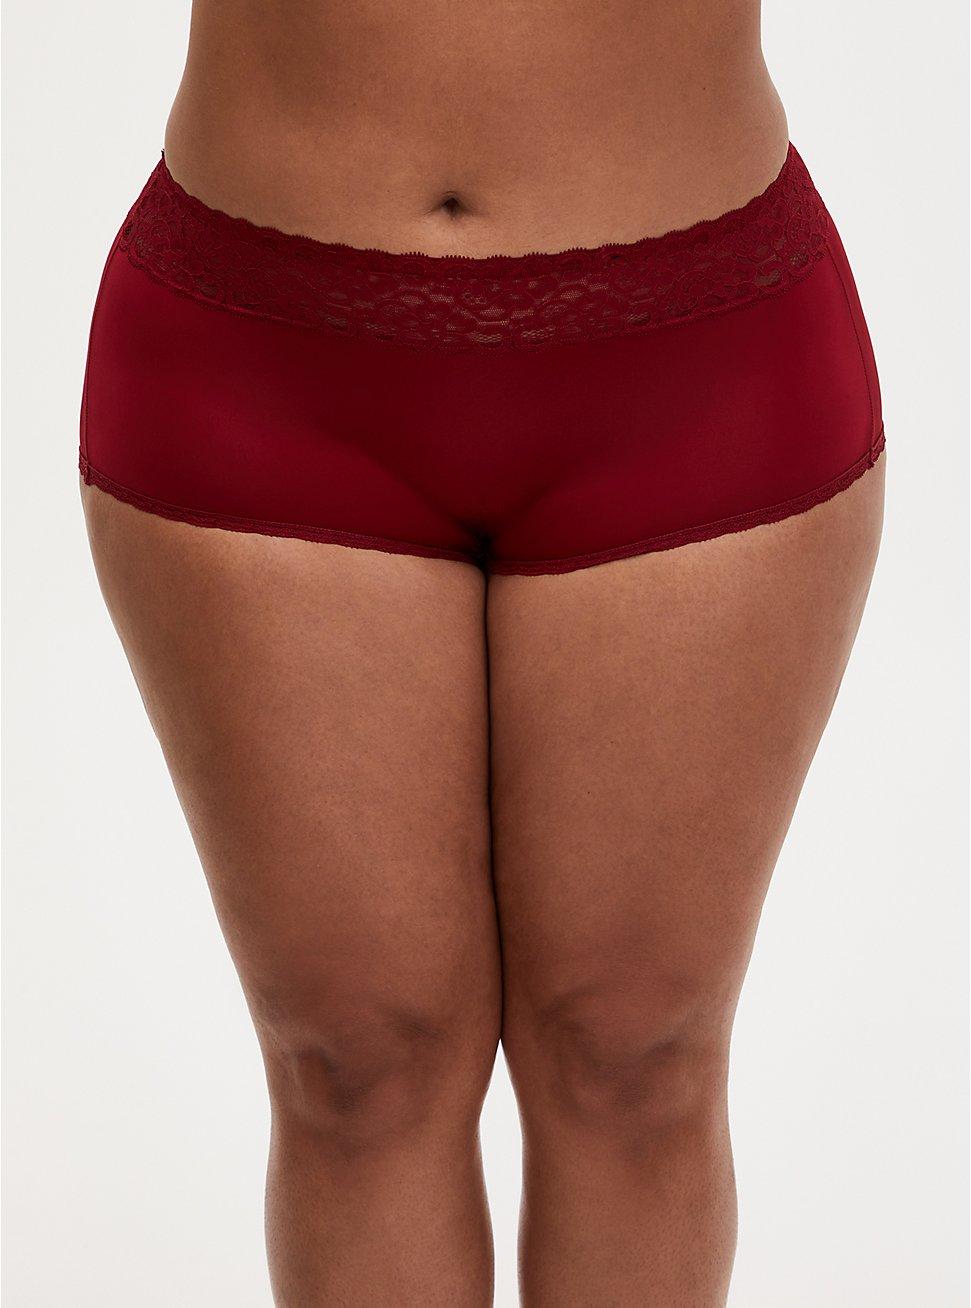 Dark Red Second Skin Brief Panty, , hi-res